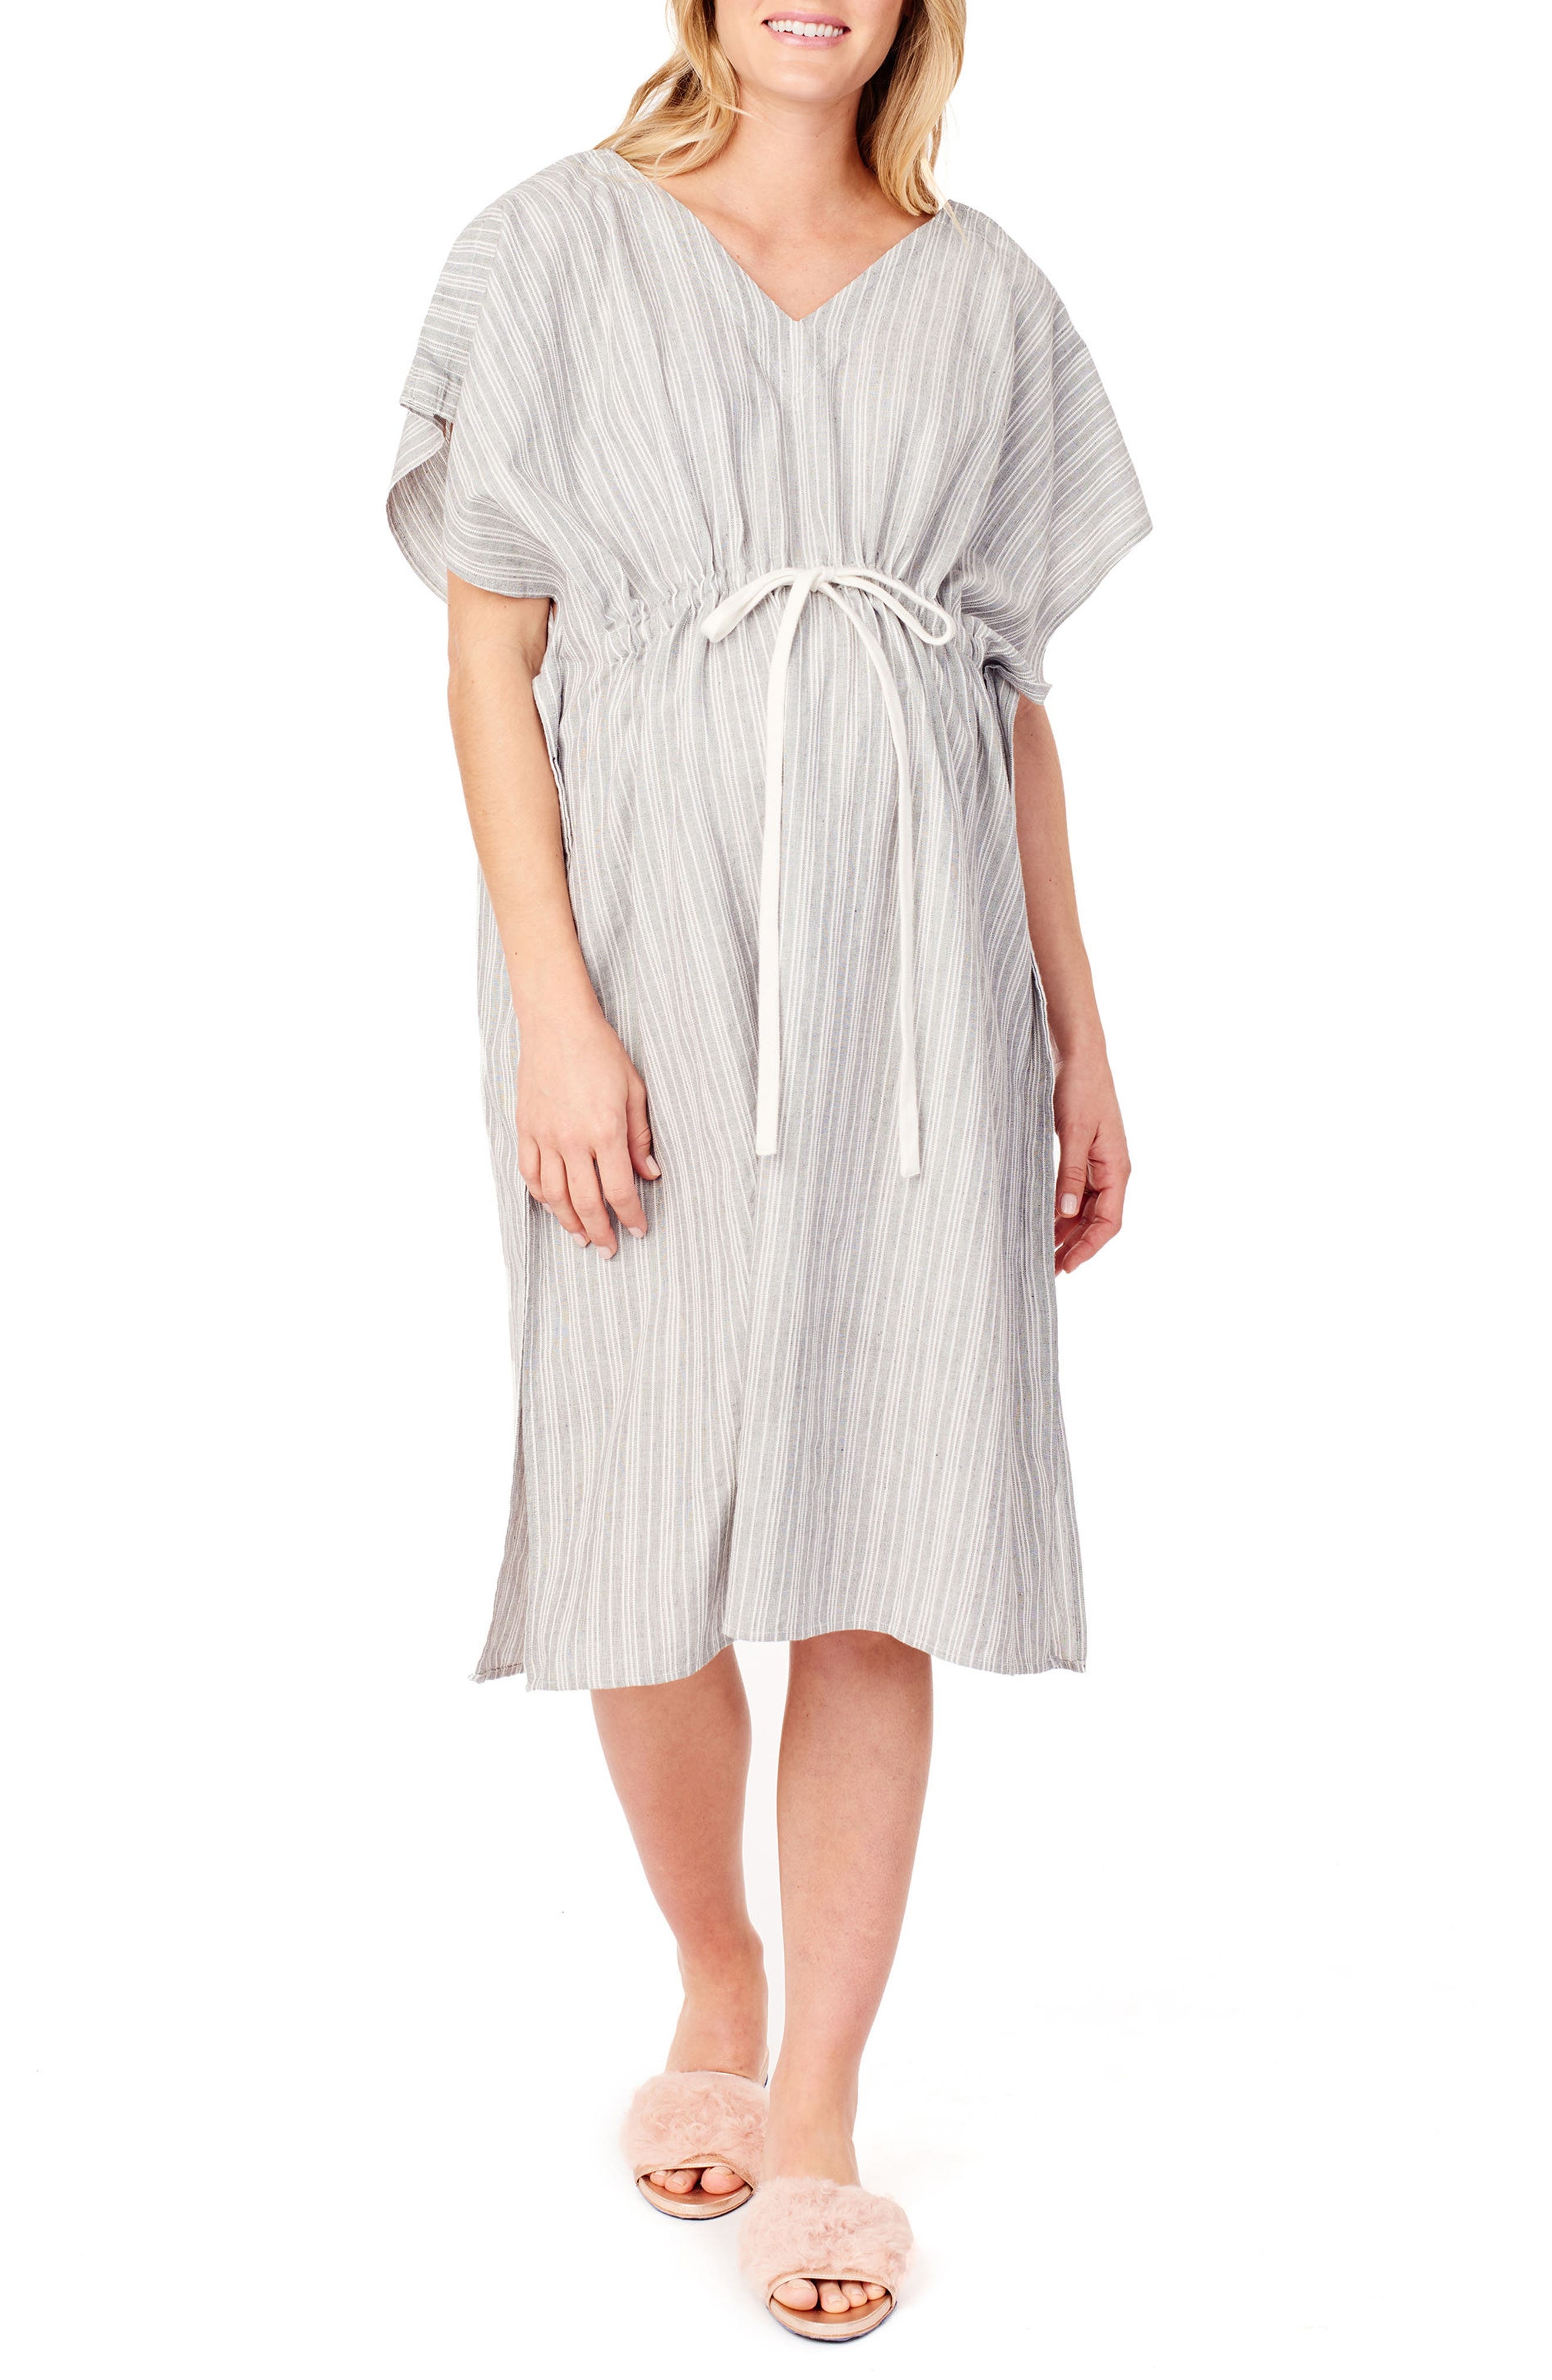 Ingrid & Isabel X James Fox & Co. Maternity/nursing Hospital Gown, Size One Size - Black